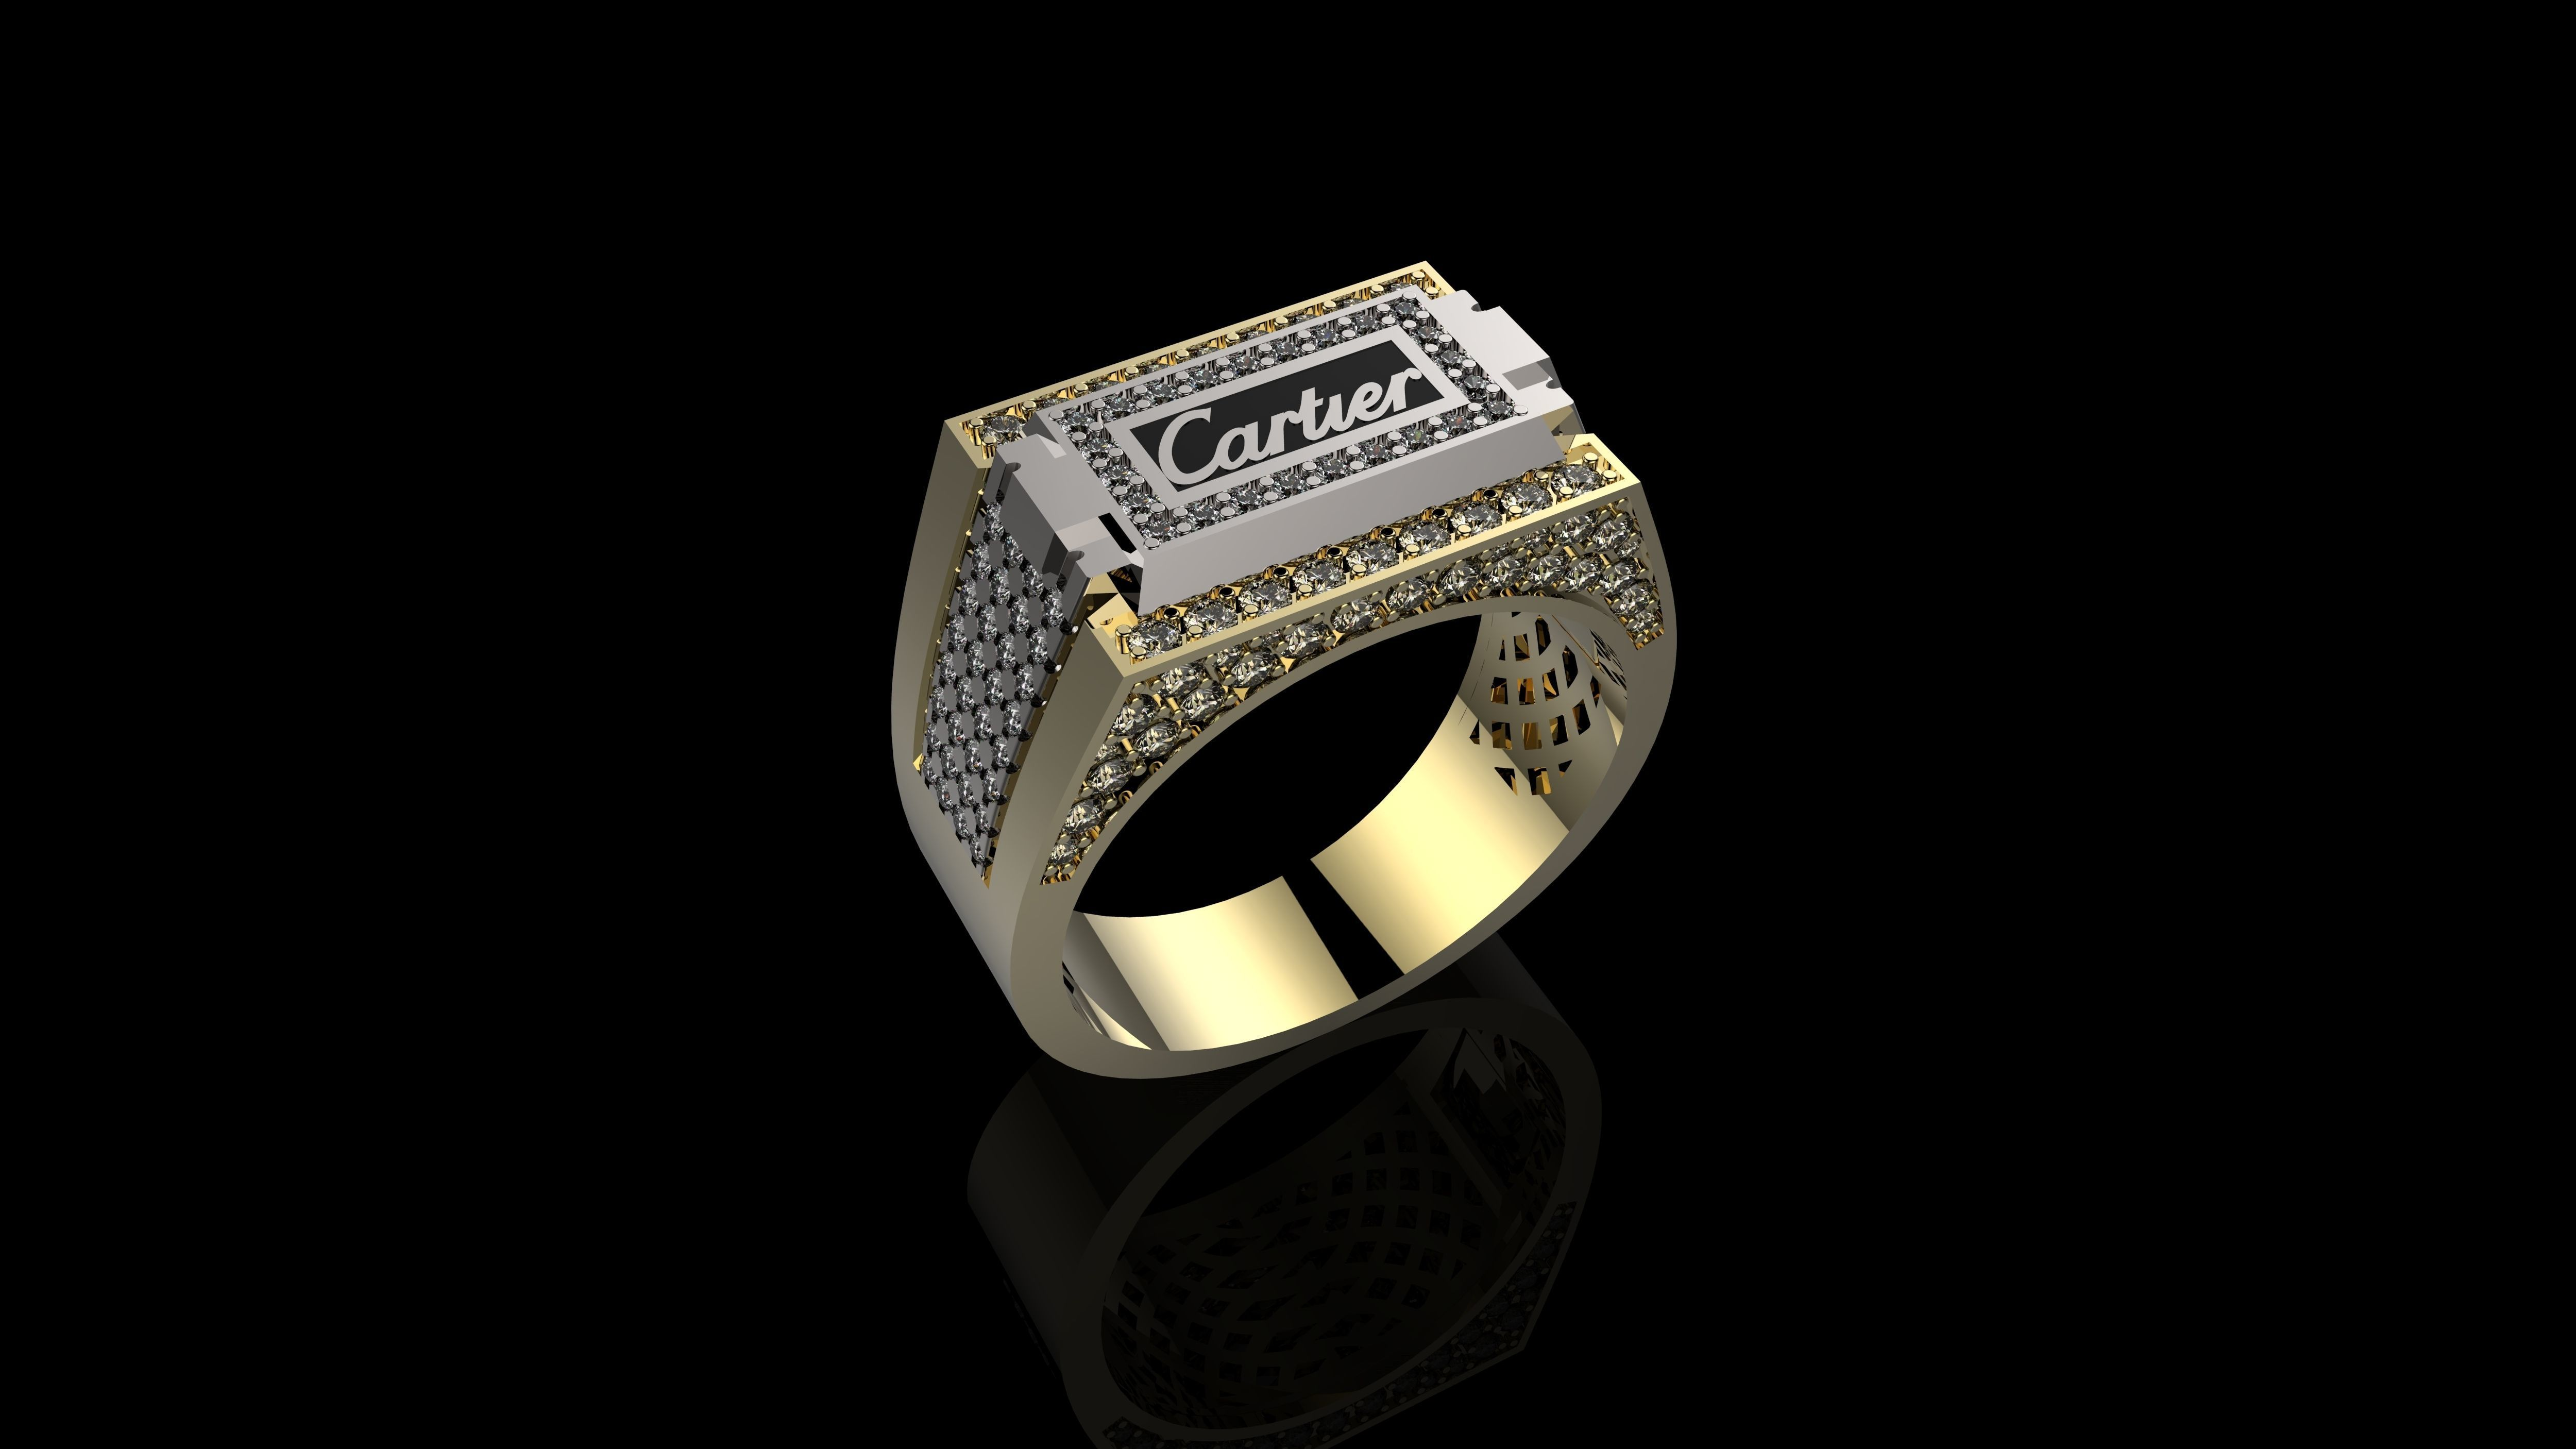 1d23978a97b62 M RINGS FOR MEN N17 2 3D printable model | CGTrader